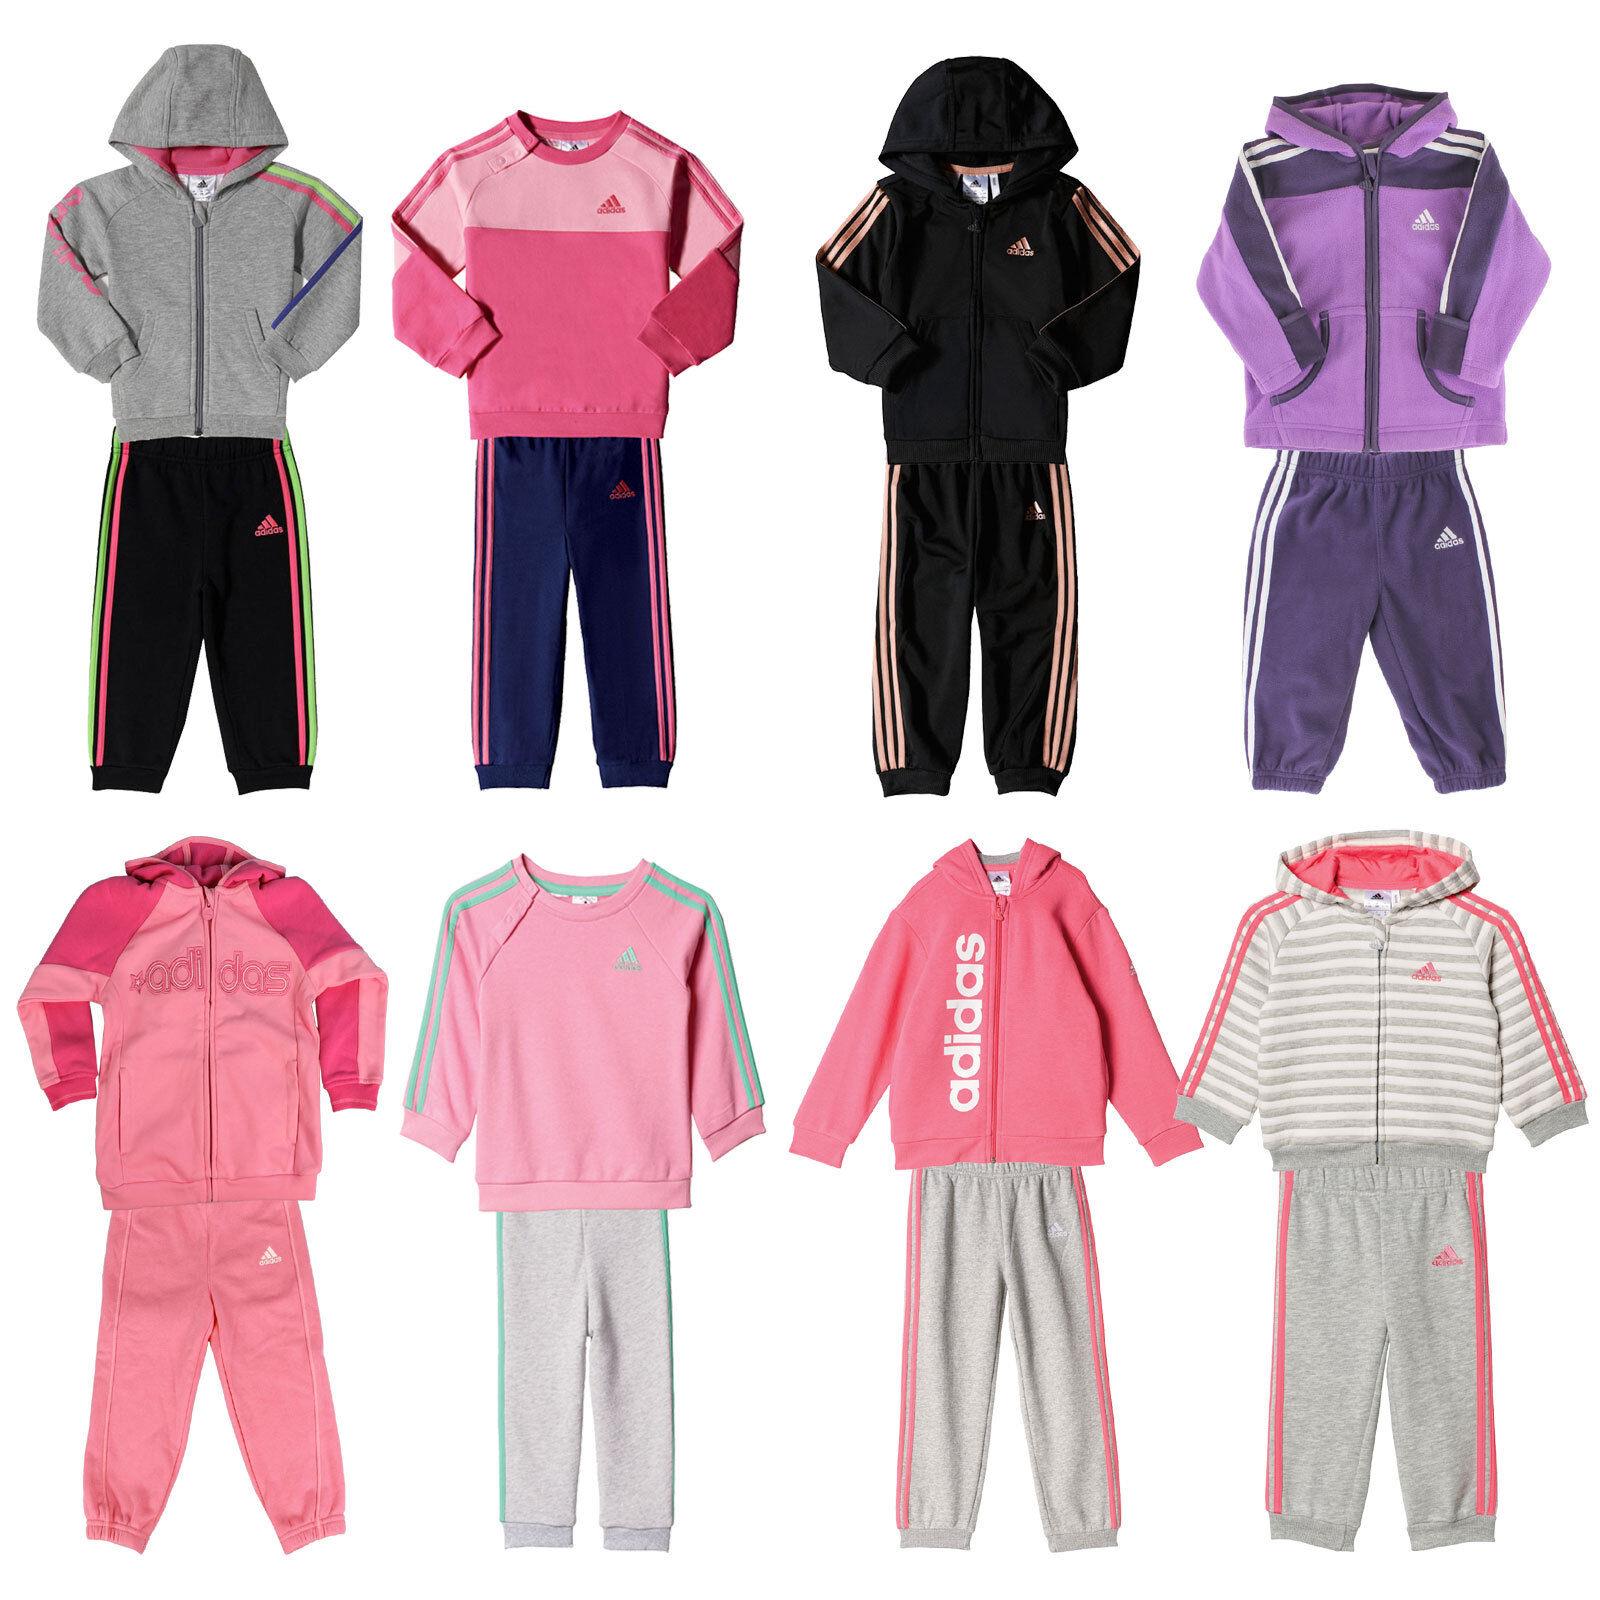 adidas Performance baby-jogger bambini-tuta Jogging mädchen-trainingsanzug Set